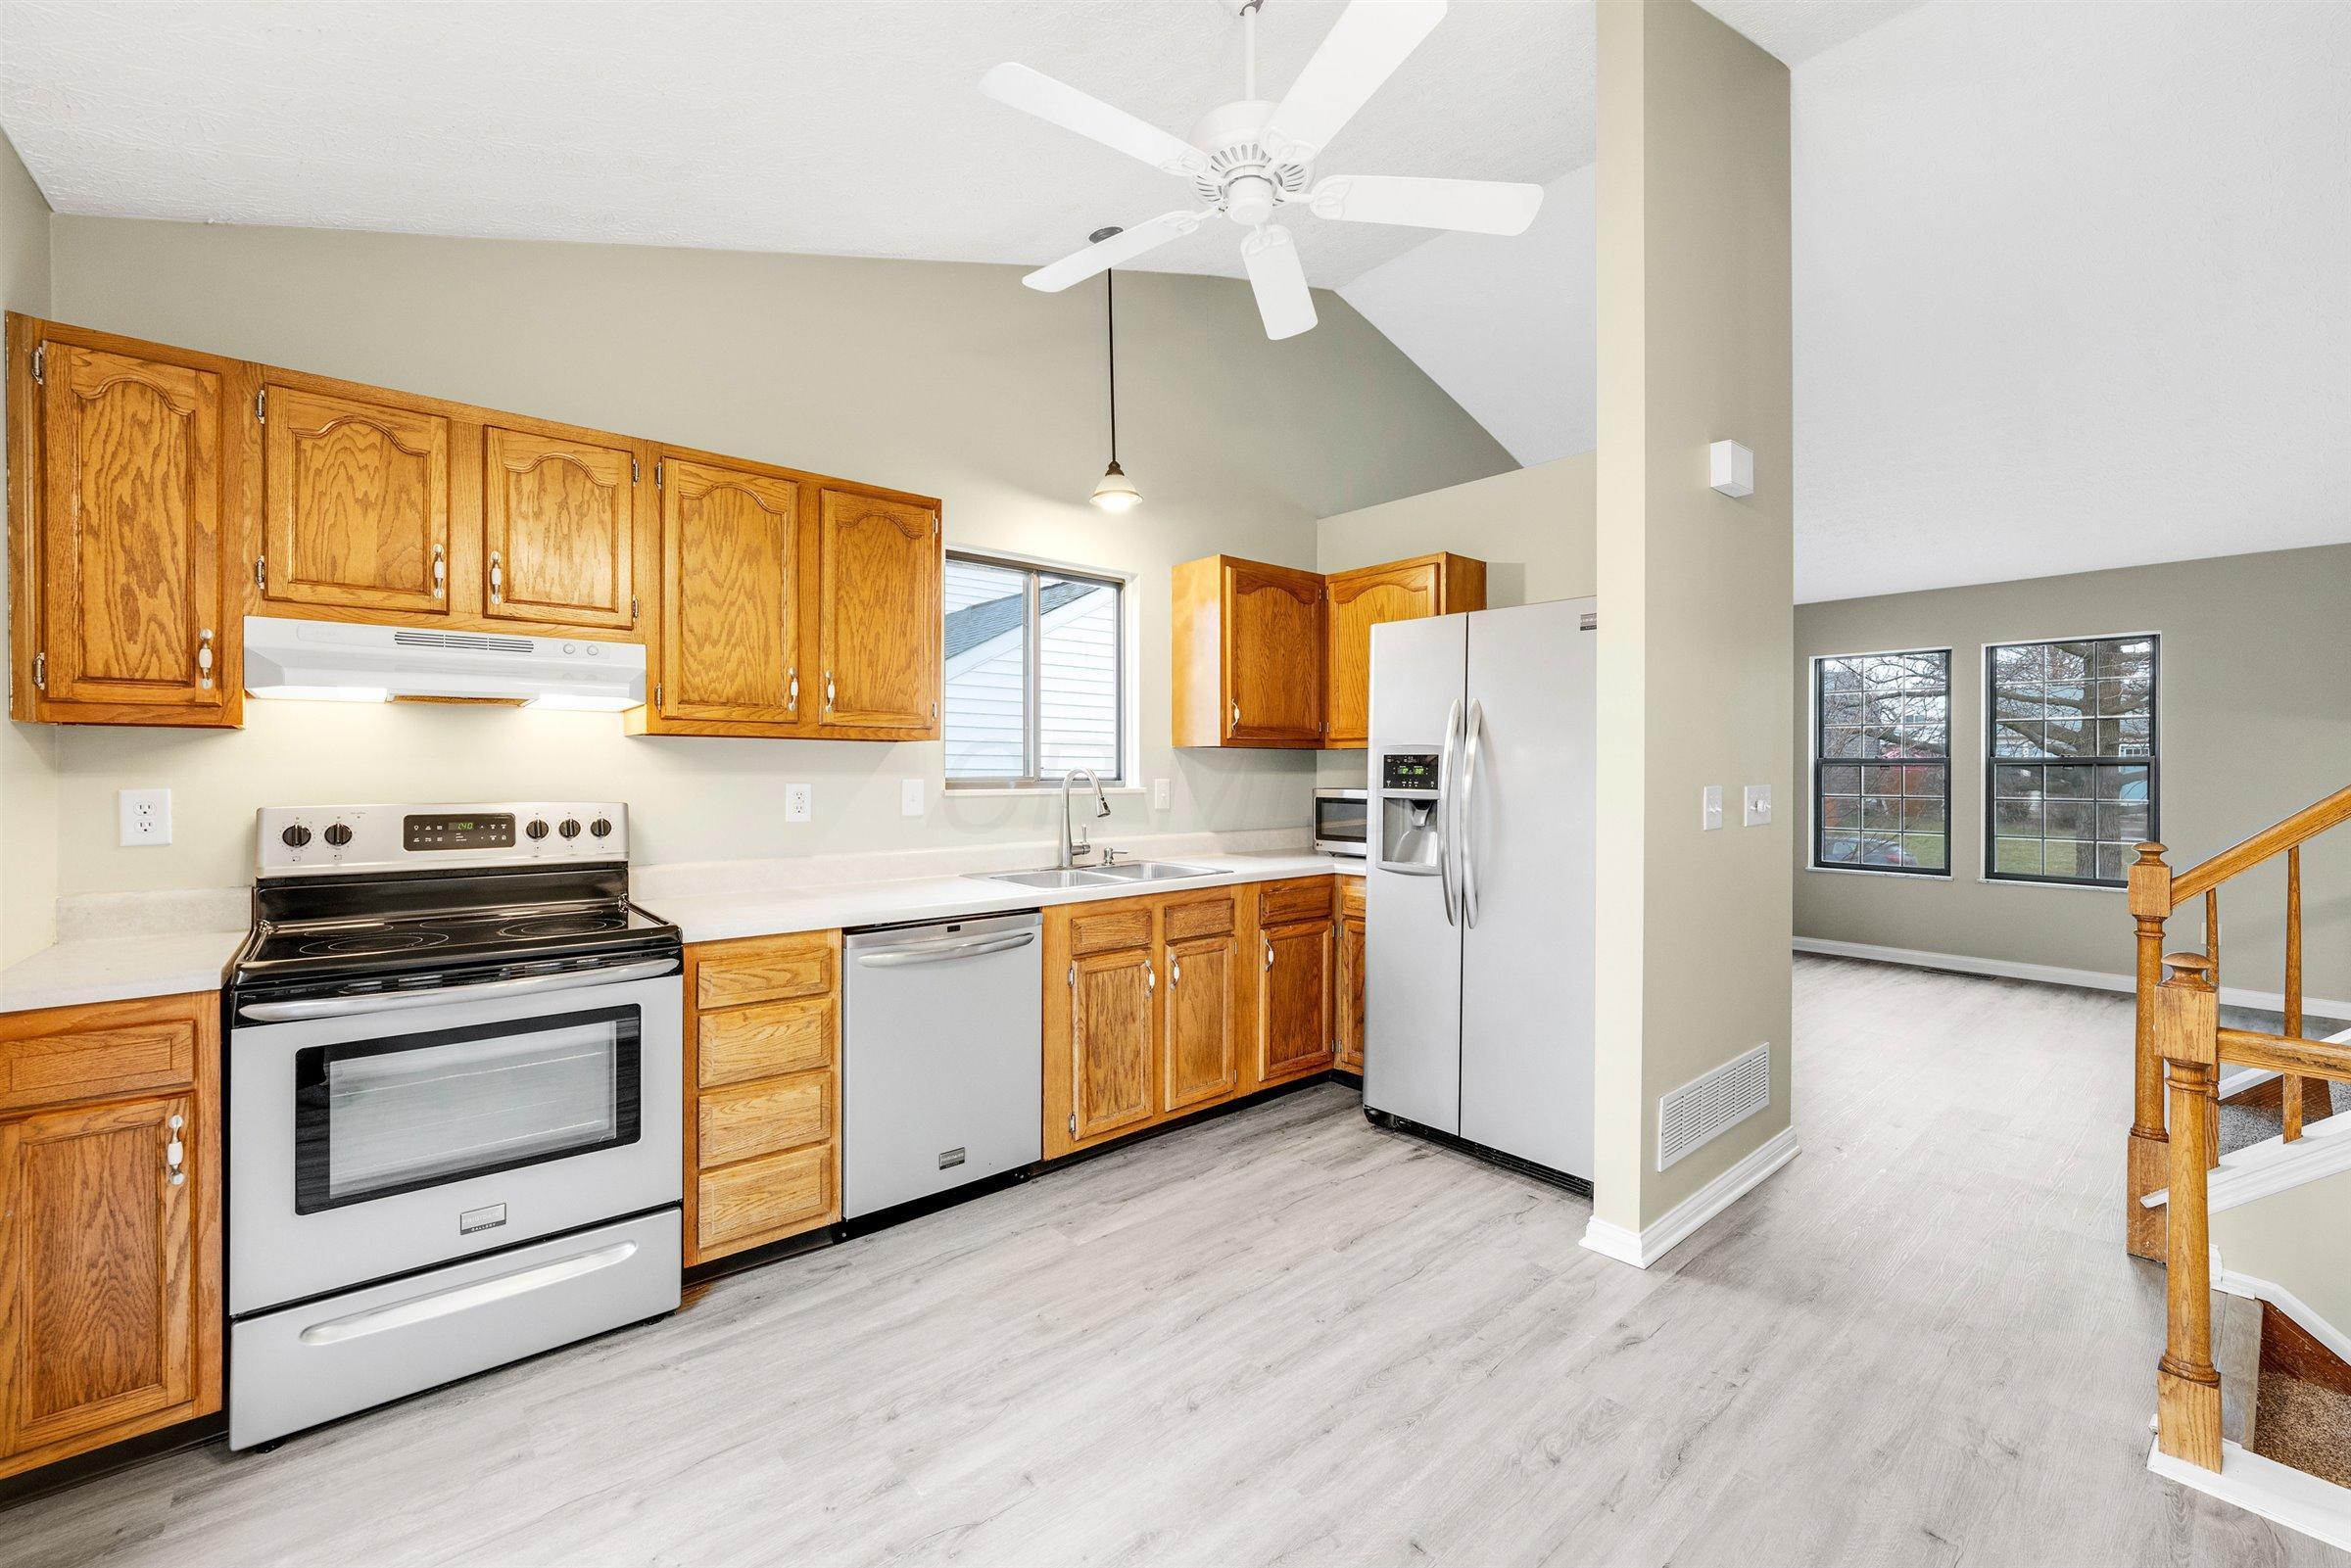 1785 Redcloud Drive, Powell, Ohio 43065, 3 Bedrooms Bedrooms, ,2 BathroomsBathrooms,Residential,For Sale,Redcloud,221001035